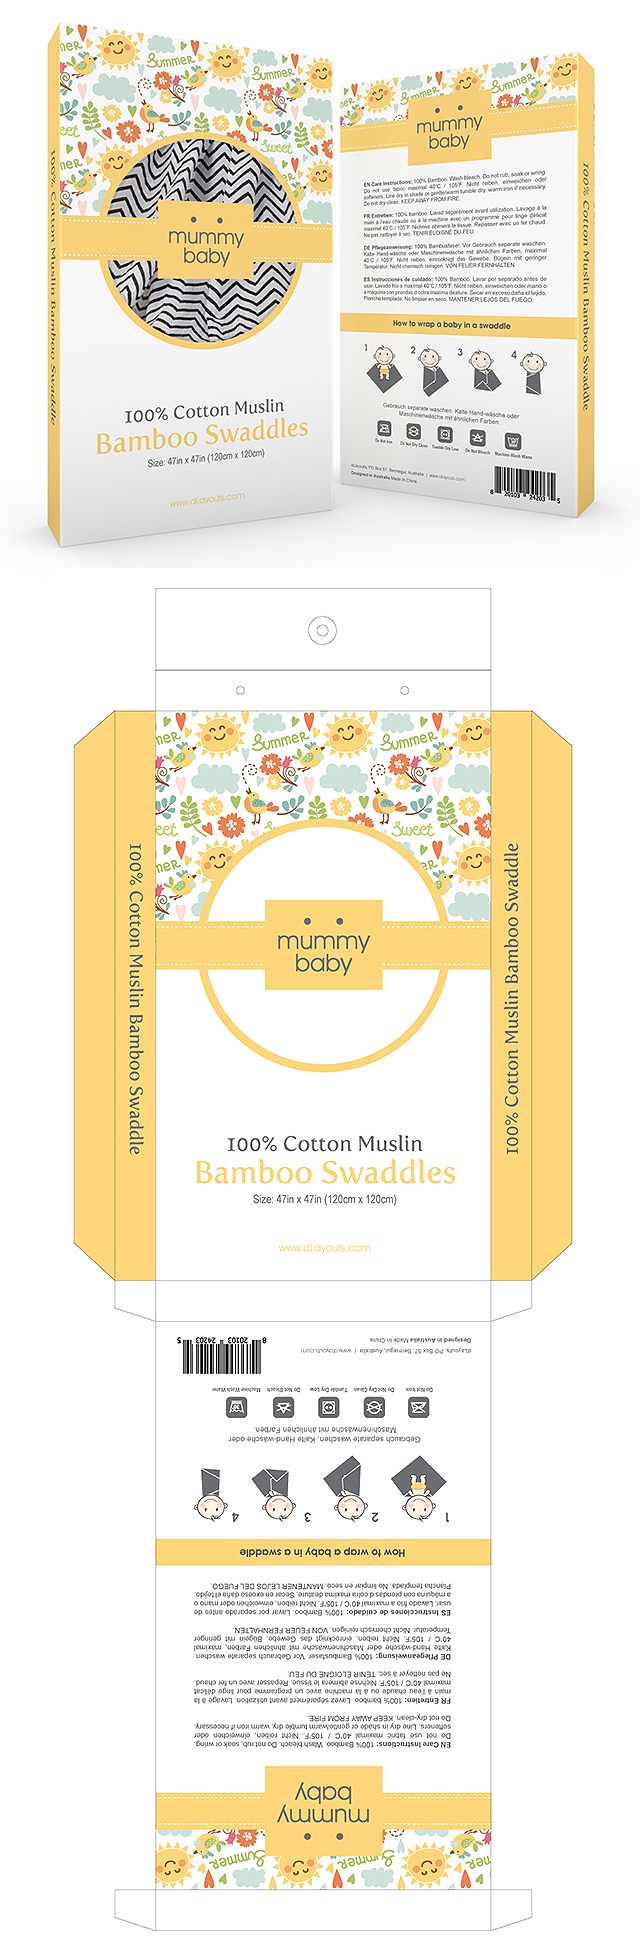 Baby Muslin Swaddle Packaging Template